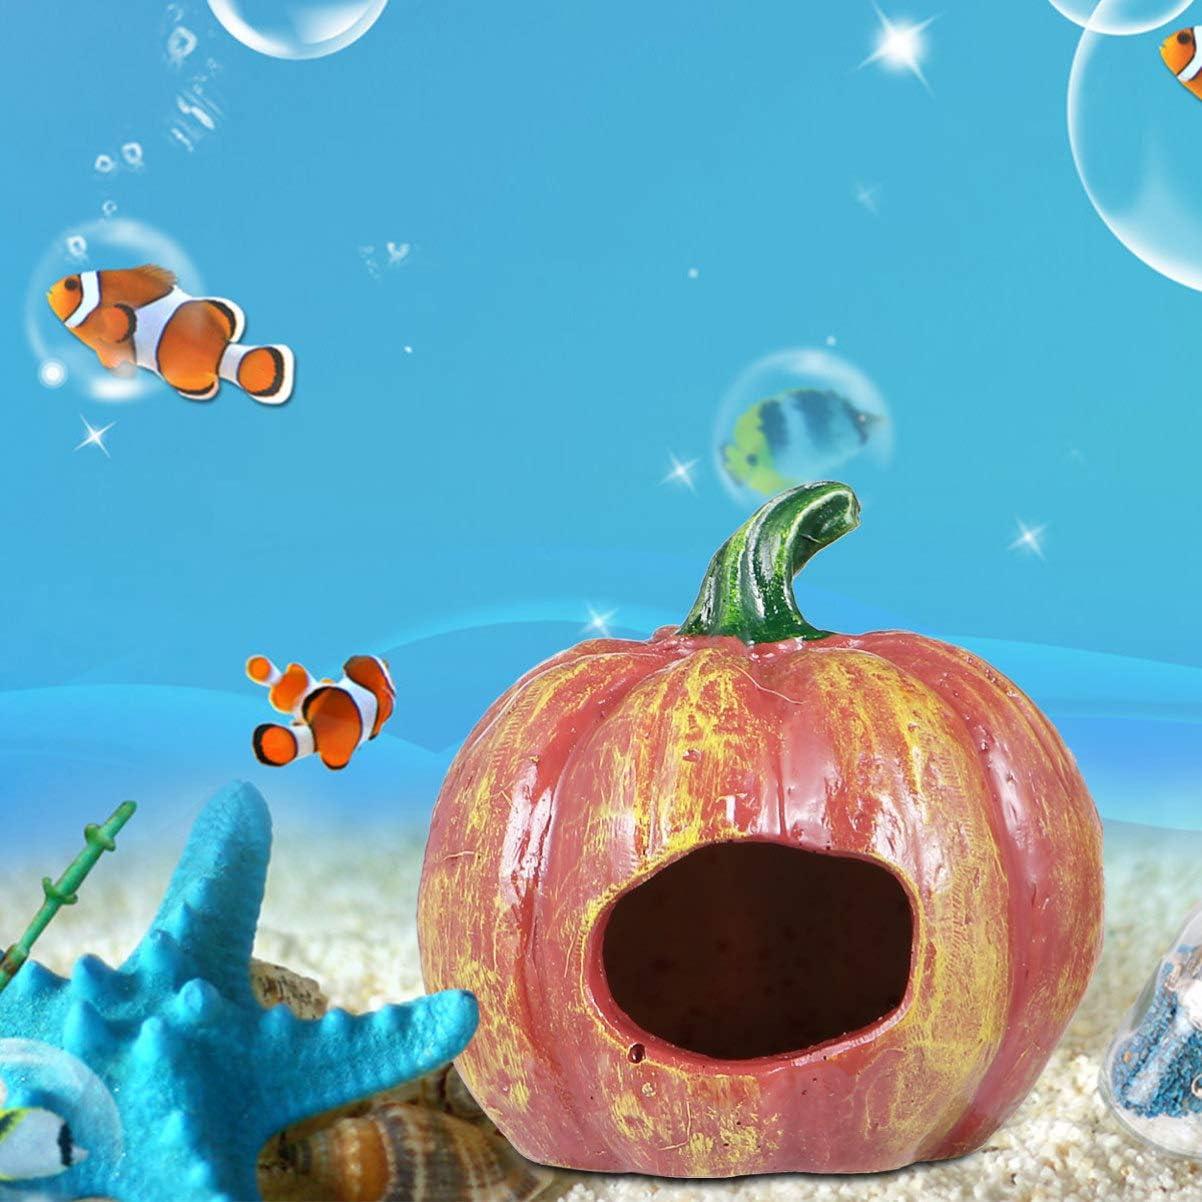 Balacoo 8pcs Resin Pumkin Fish Hideout with Artificial Aquarium Plants Decorative Fish Tank Cave Halloween Aquarium Ornament Fish Tank Decor